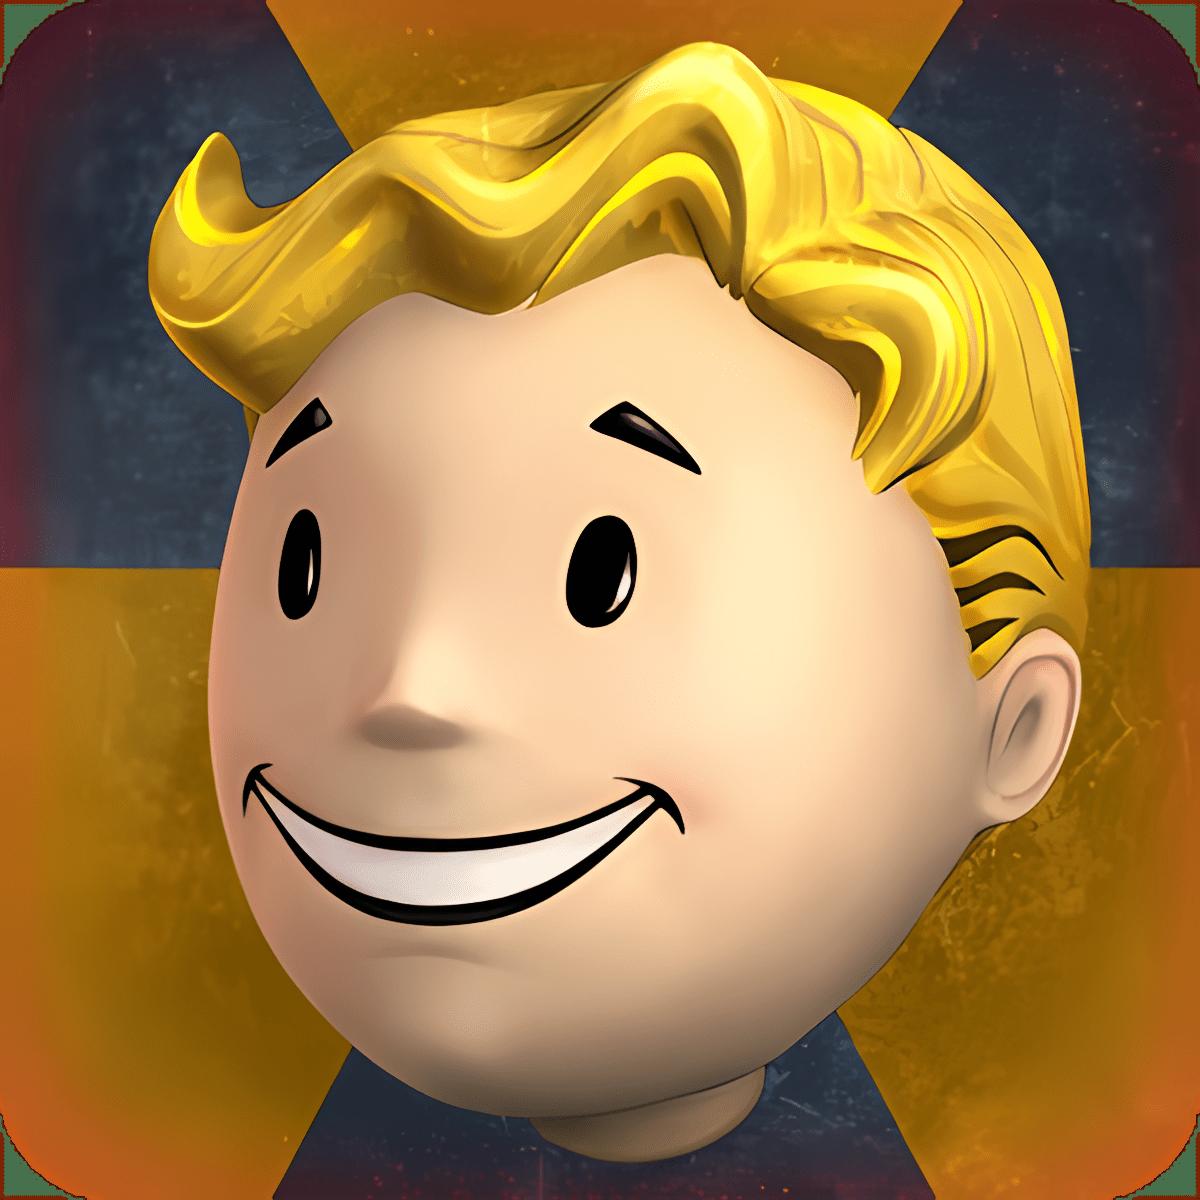 Fallout 4 Live Wallpaper